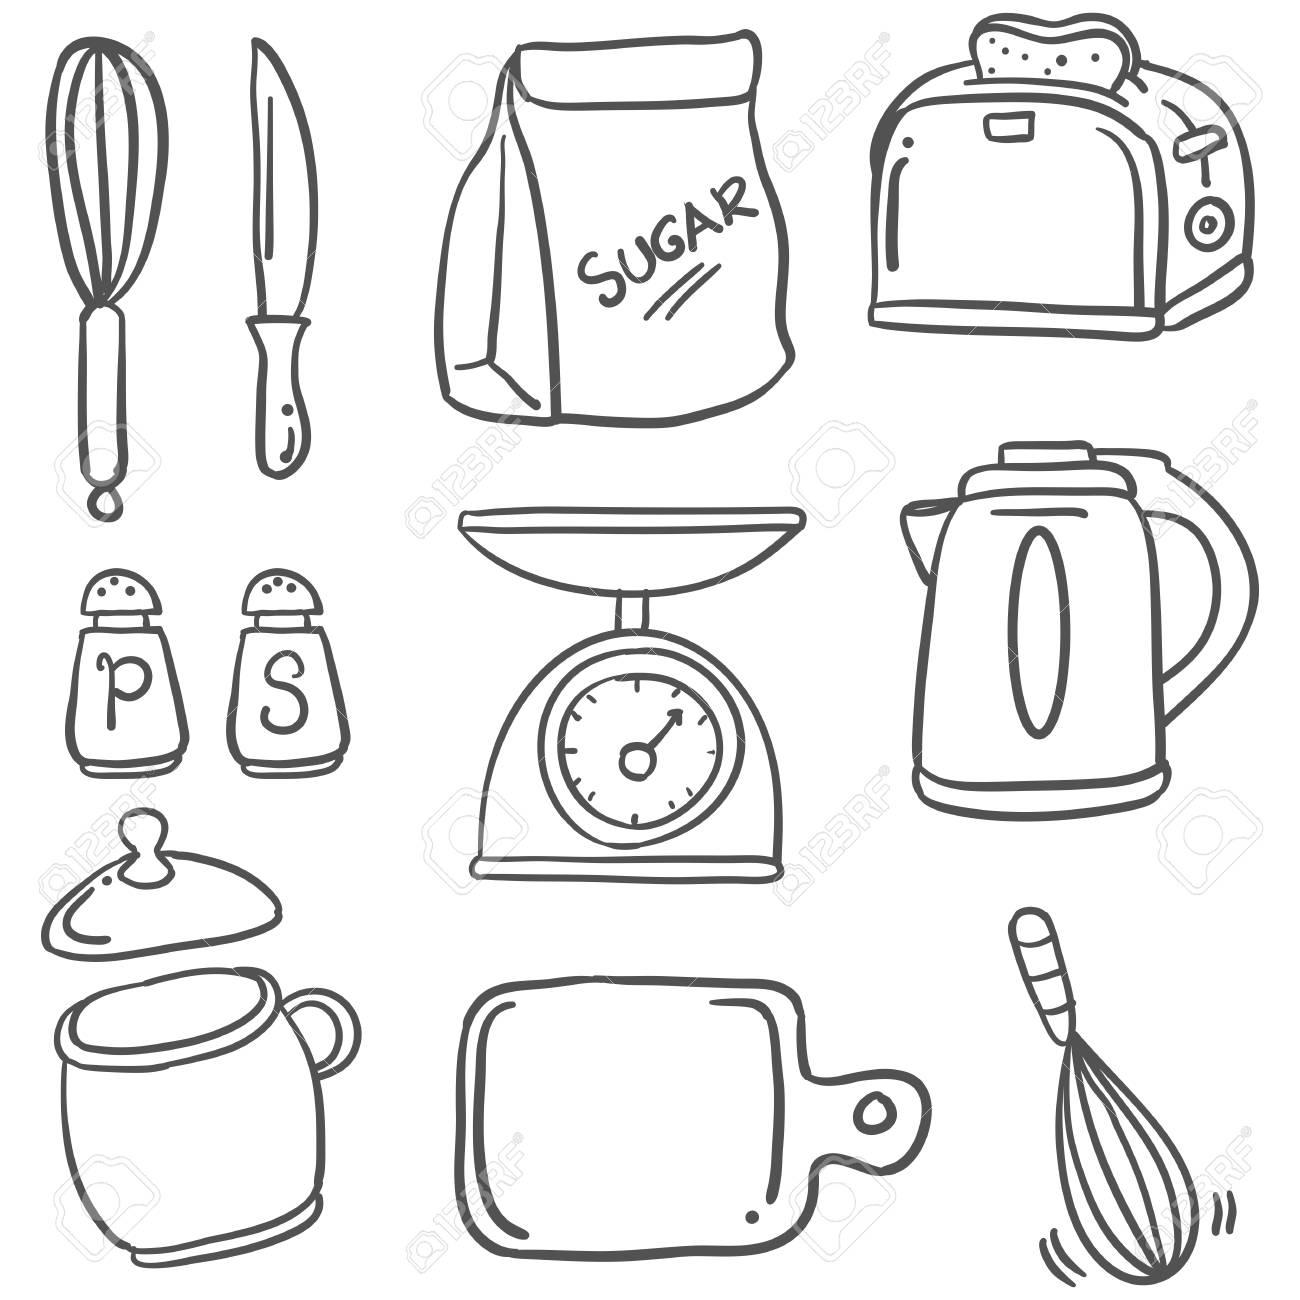 Sketched Illustration Of A Hand Draw Kitchen Set Doodles Royalty